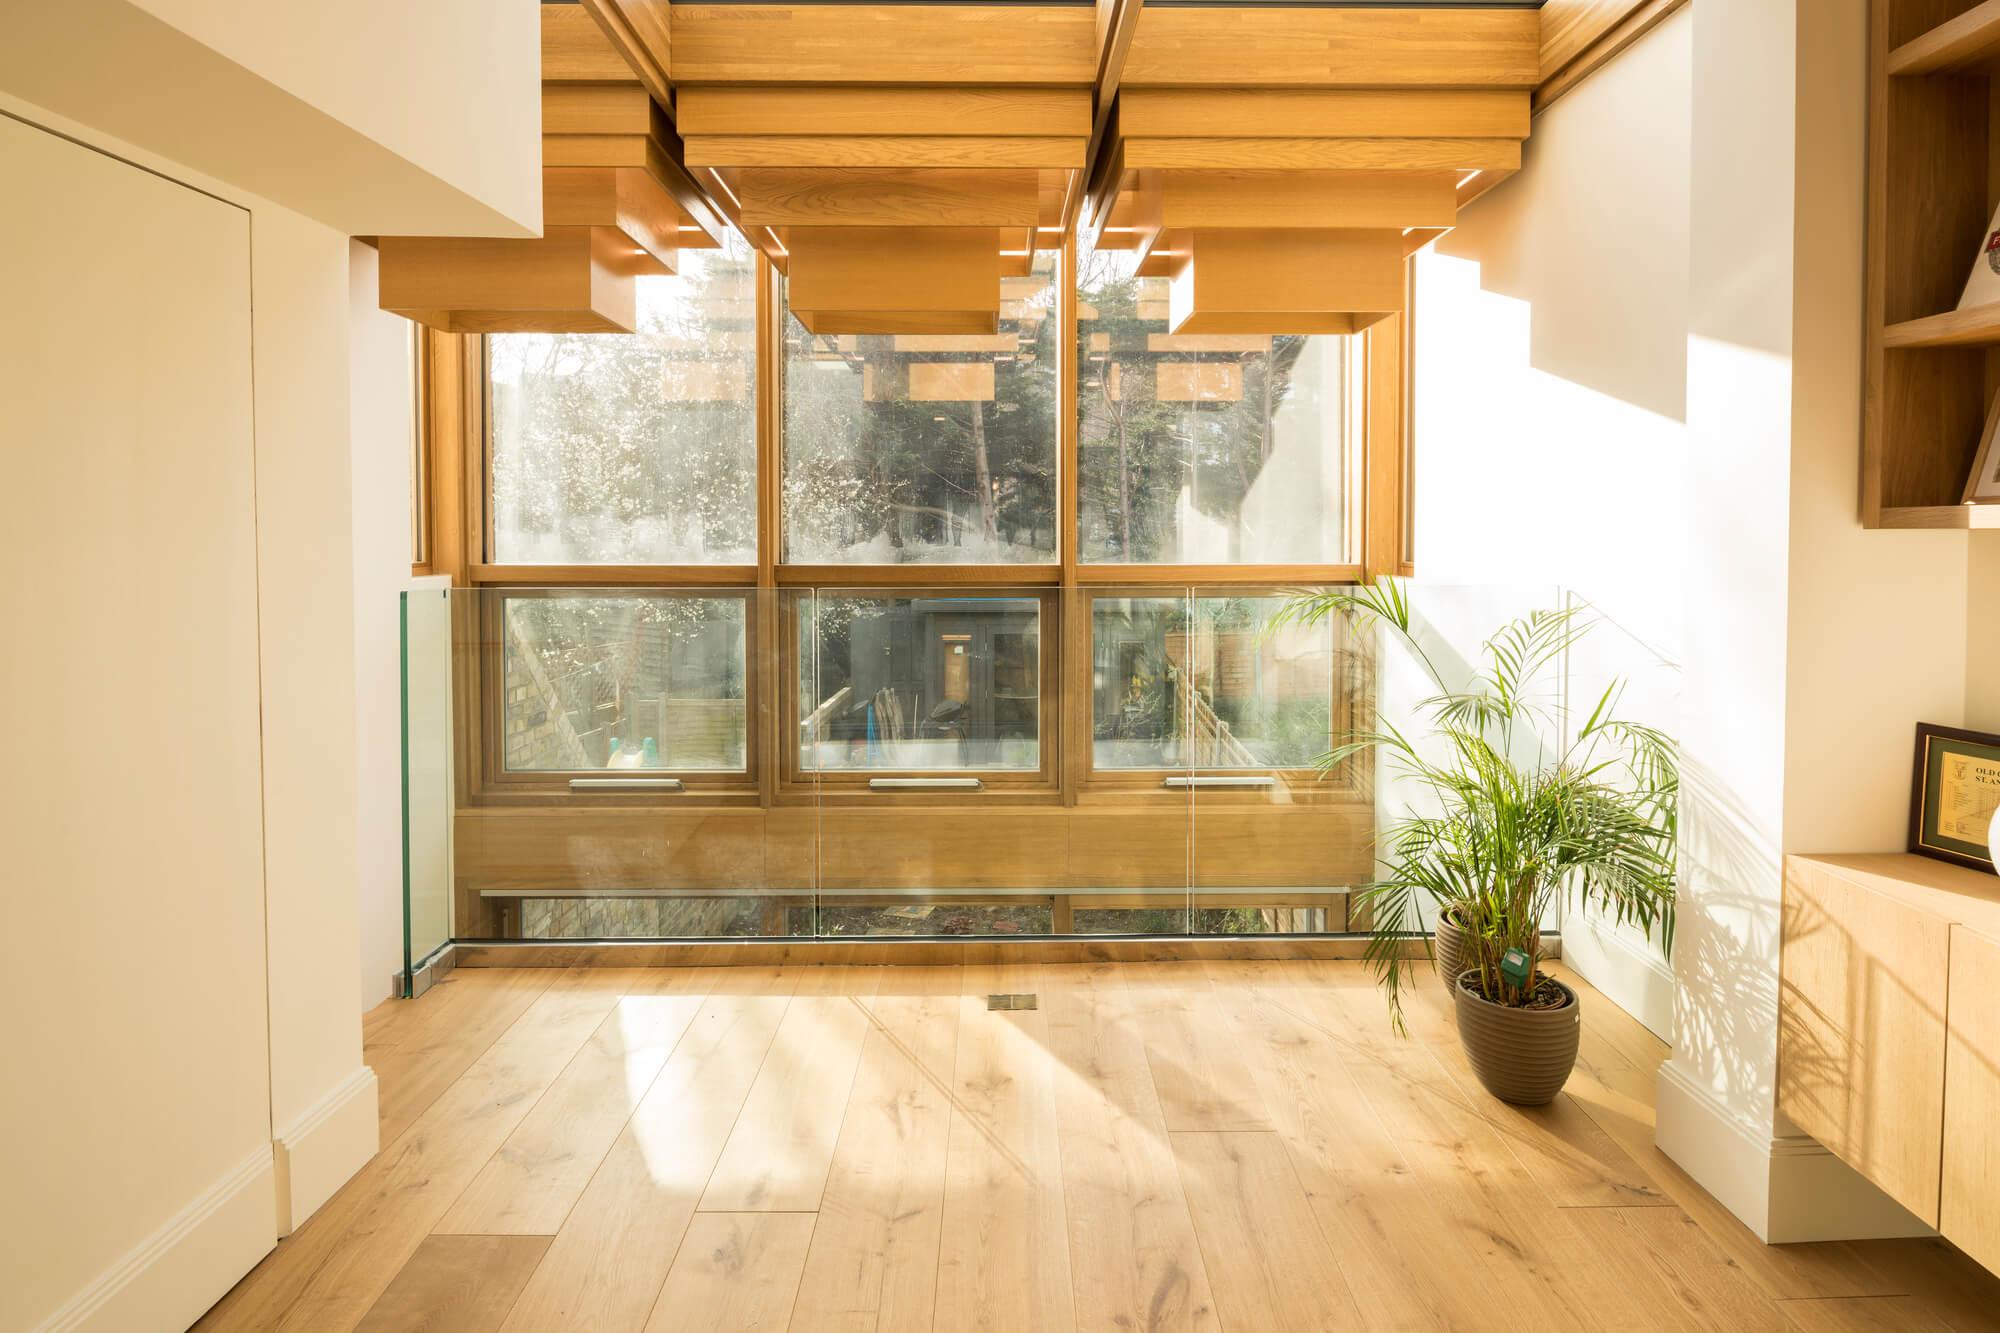 Haringey Glazed Extension by Satish Jassal Architects